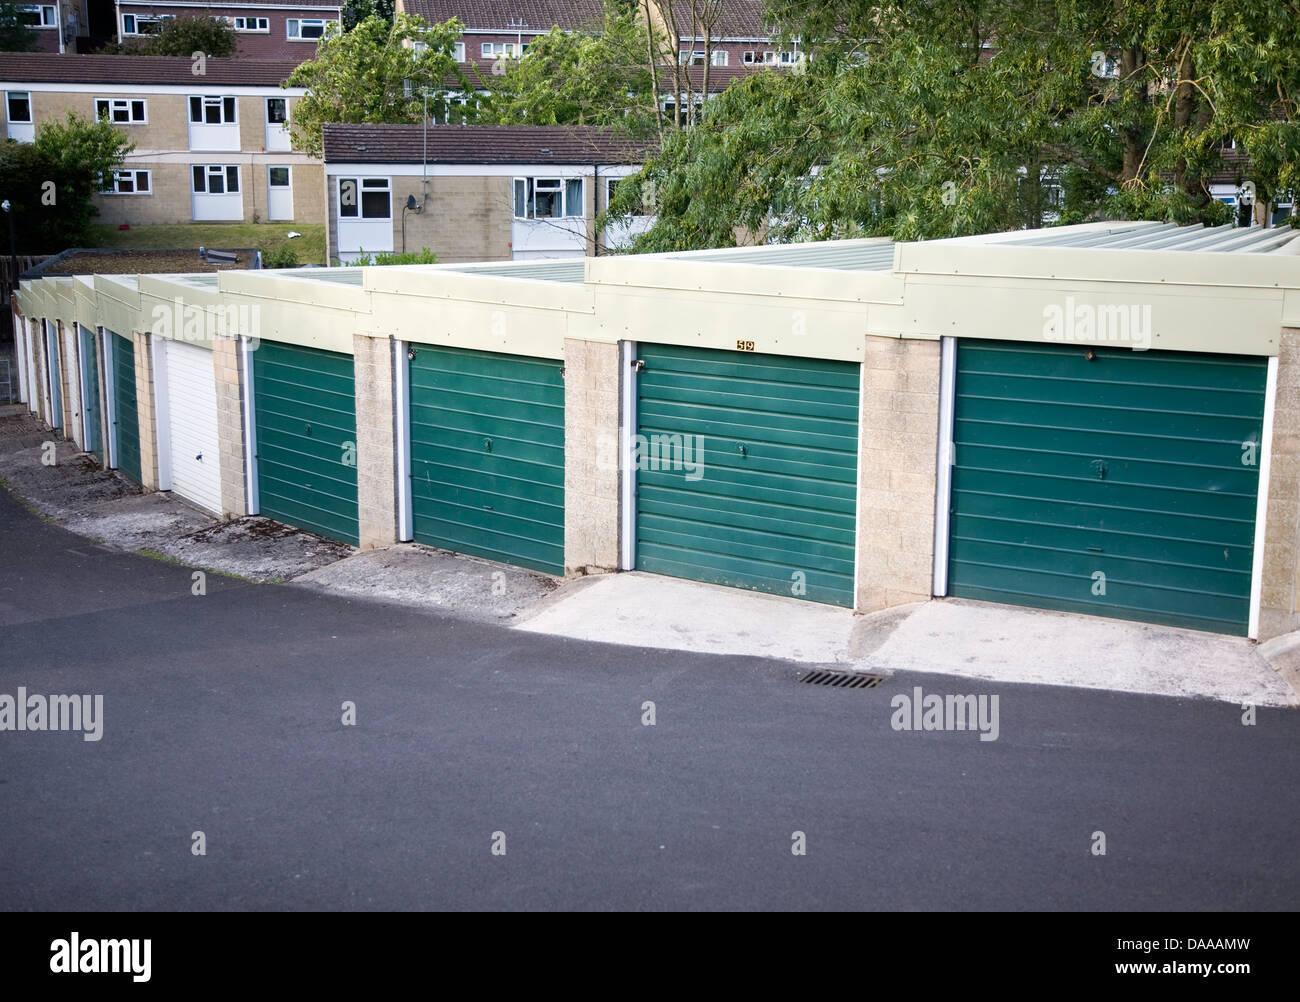 Fila de garajes en 1970 urbanización Larkhall Bath Inglaterra Imagen De Stock